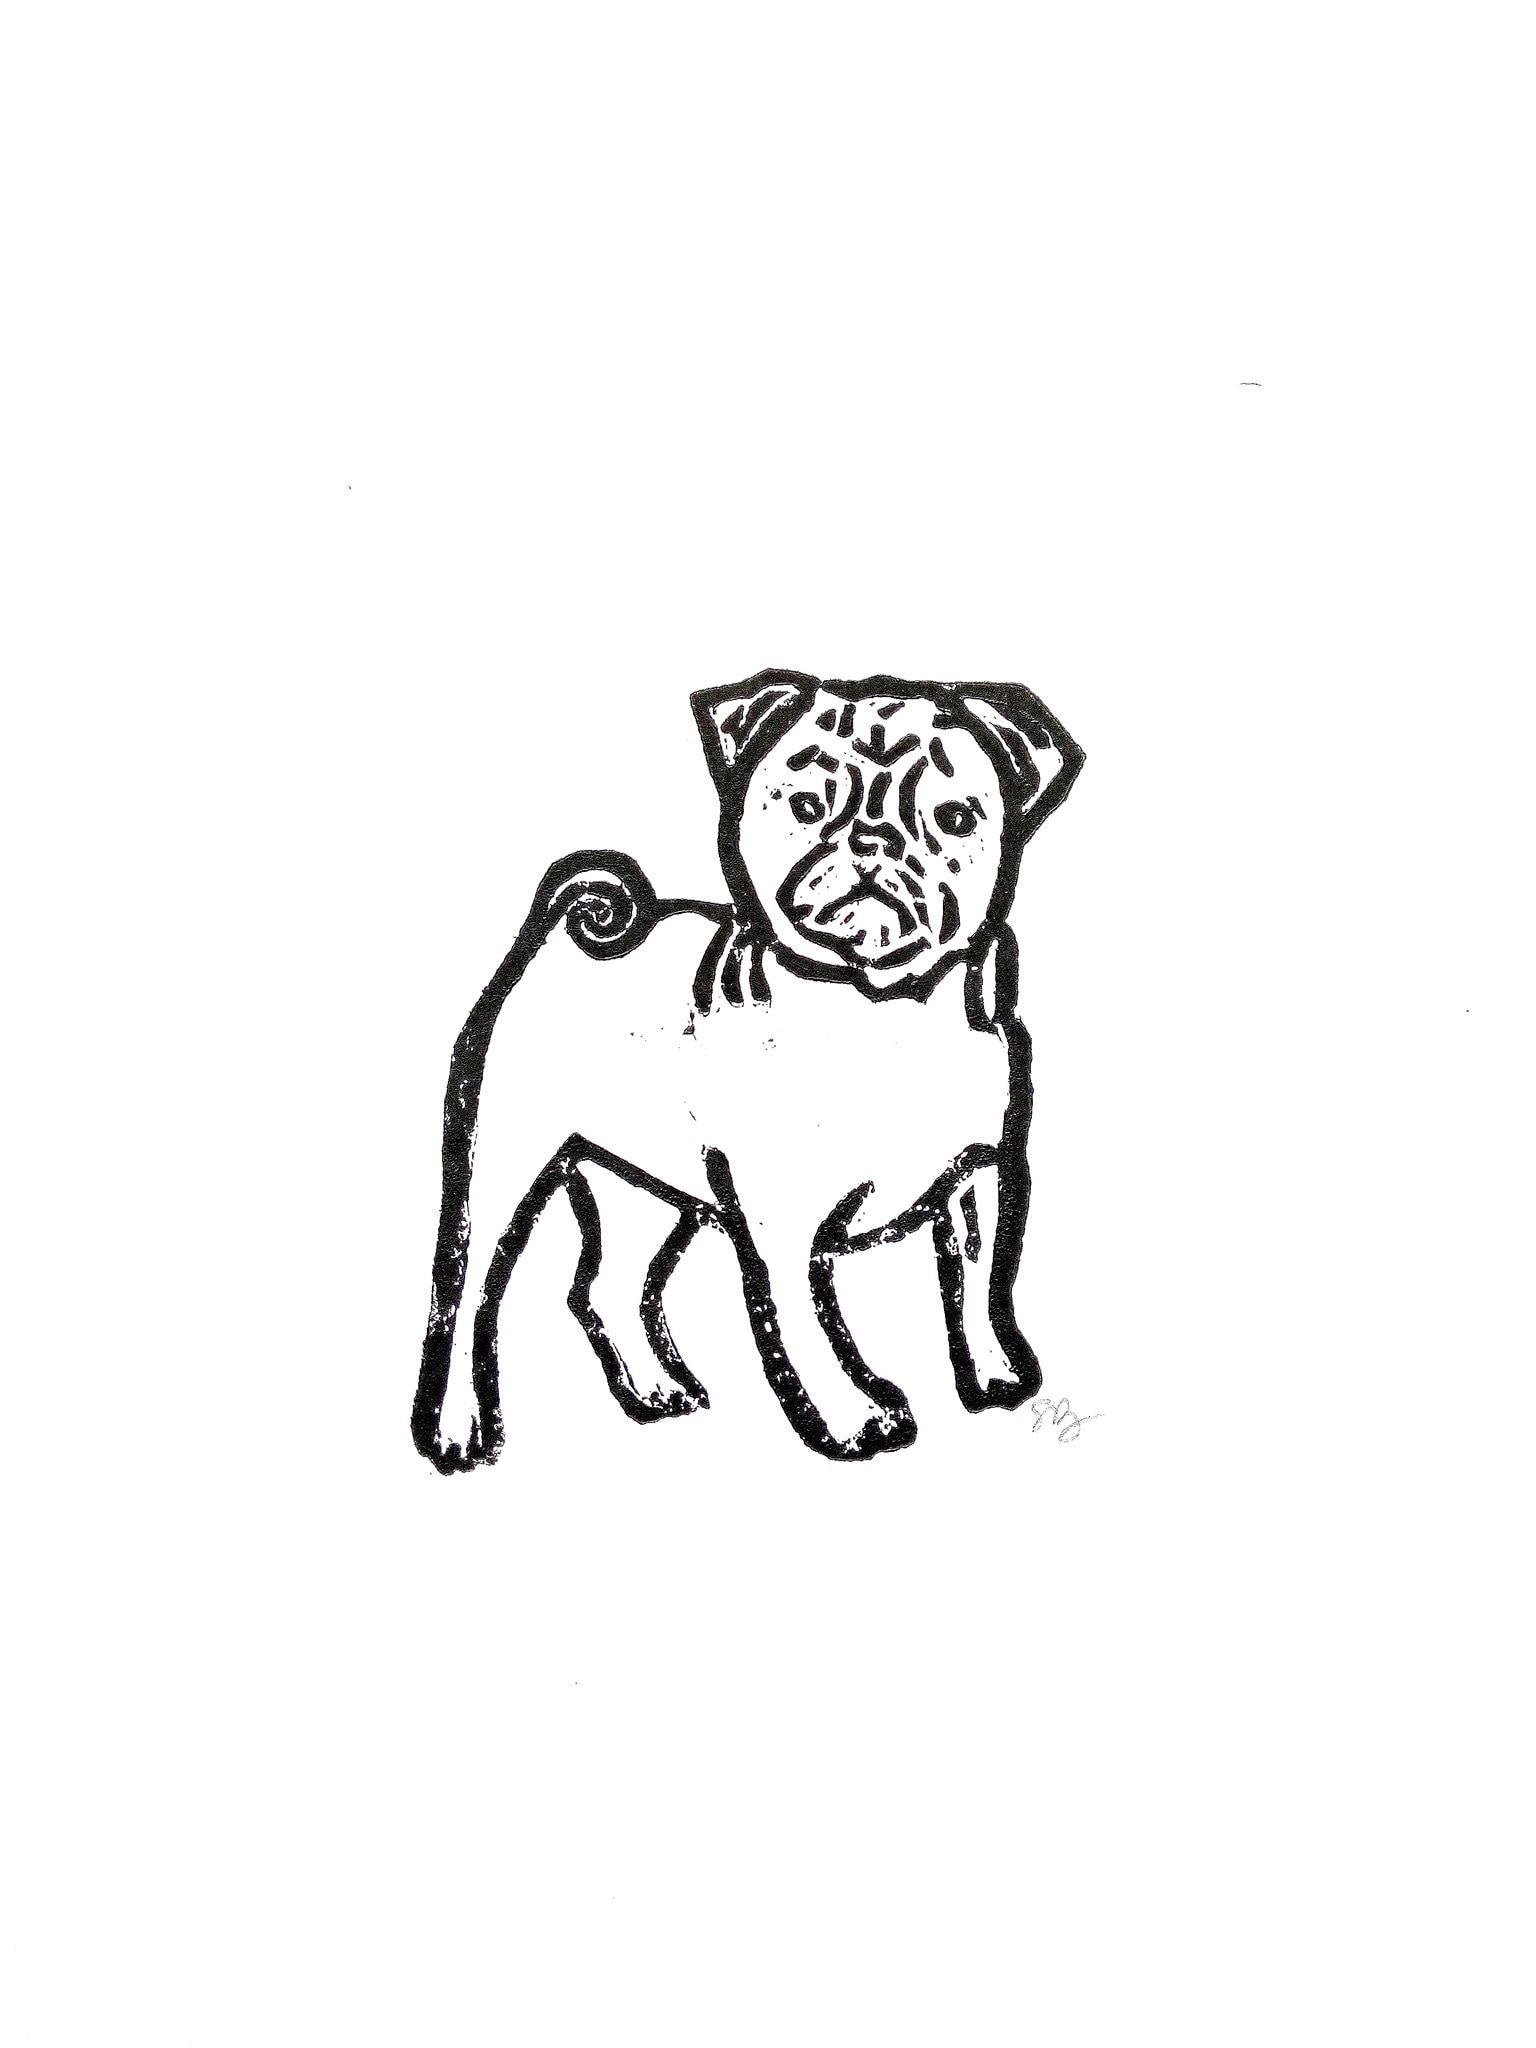 dog breed boxer 9\u201dx12\u201d wall art linoleum block print